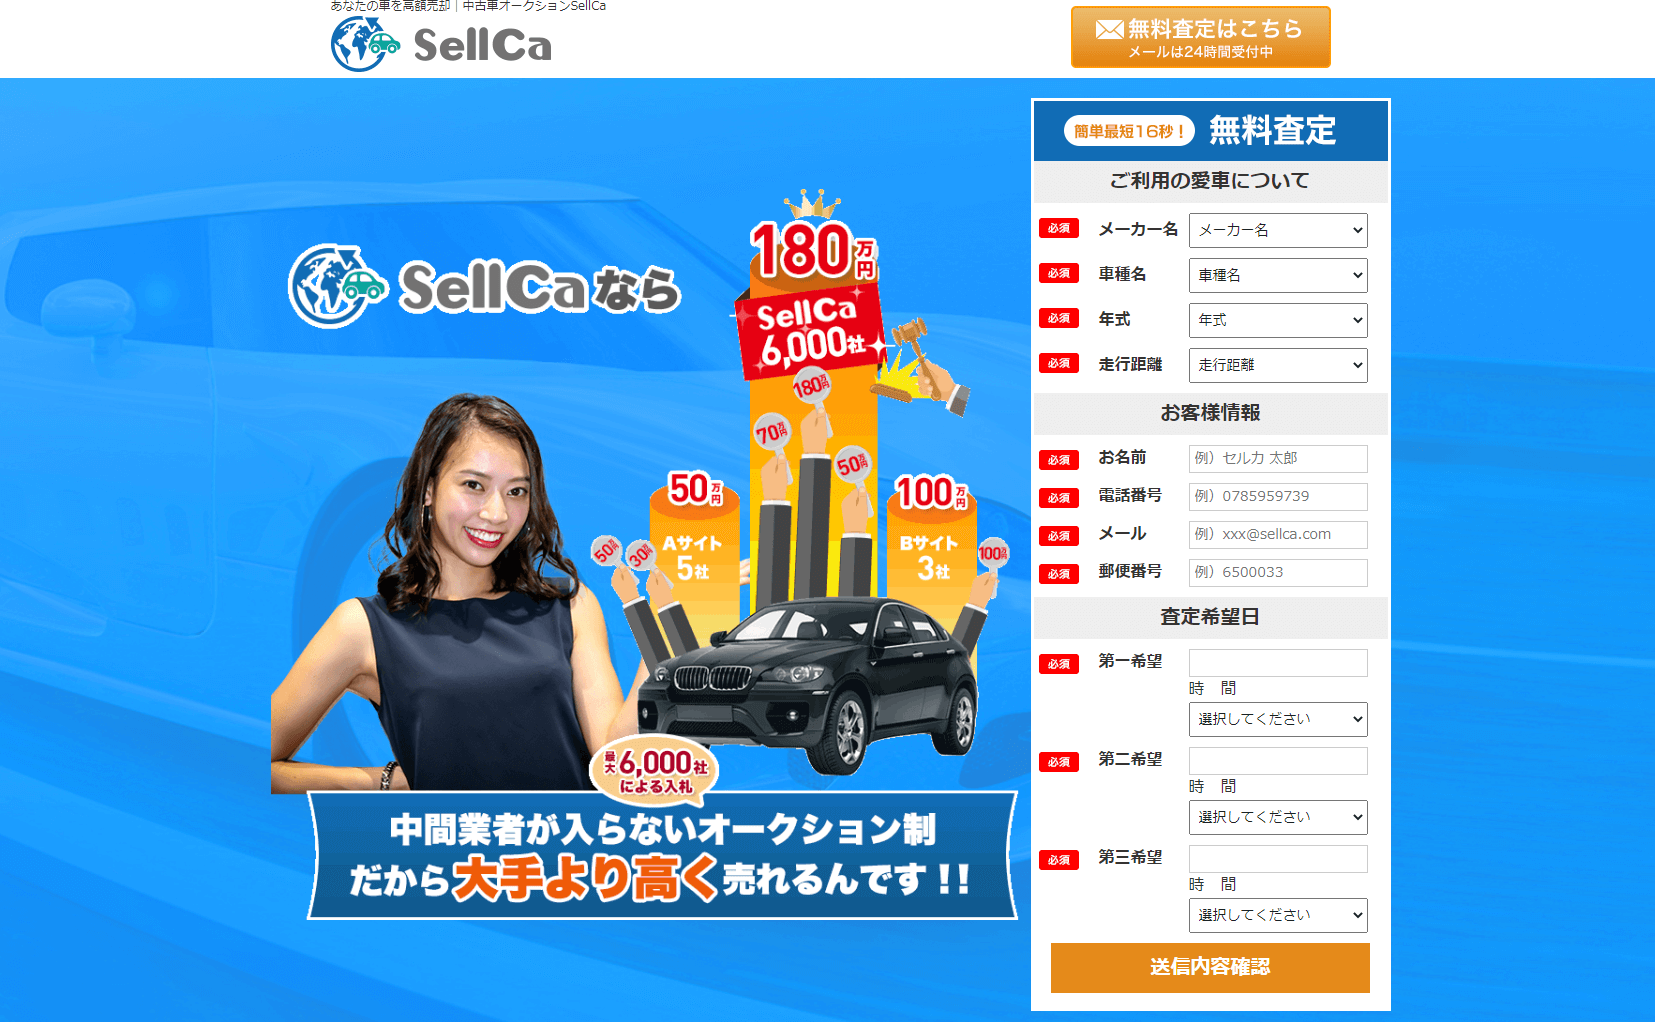 SellCa